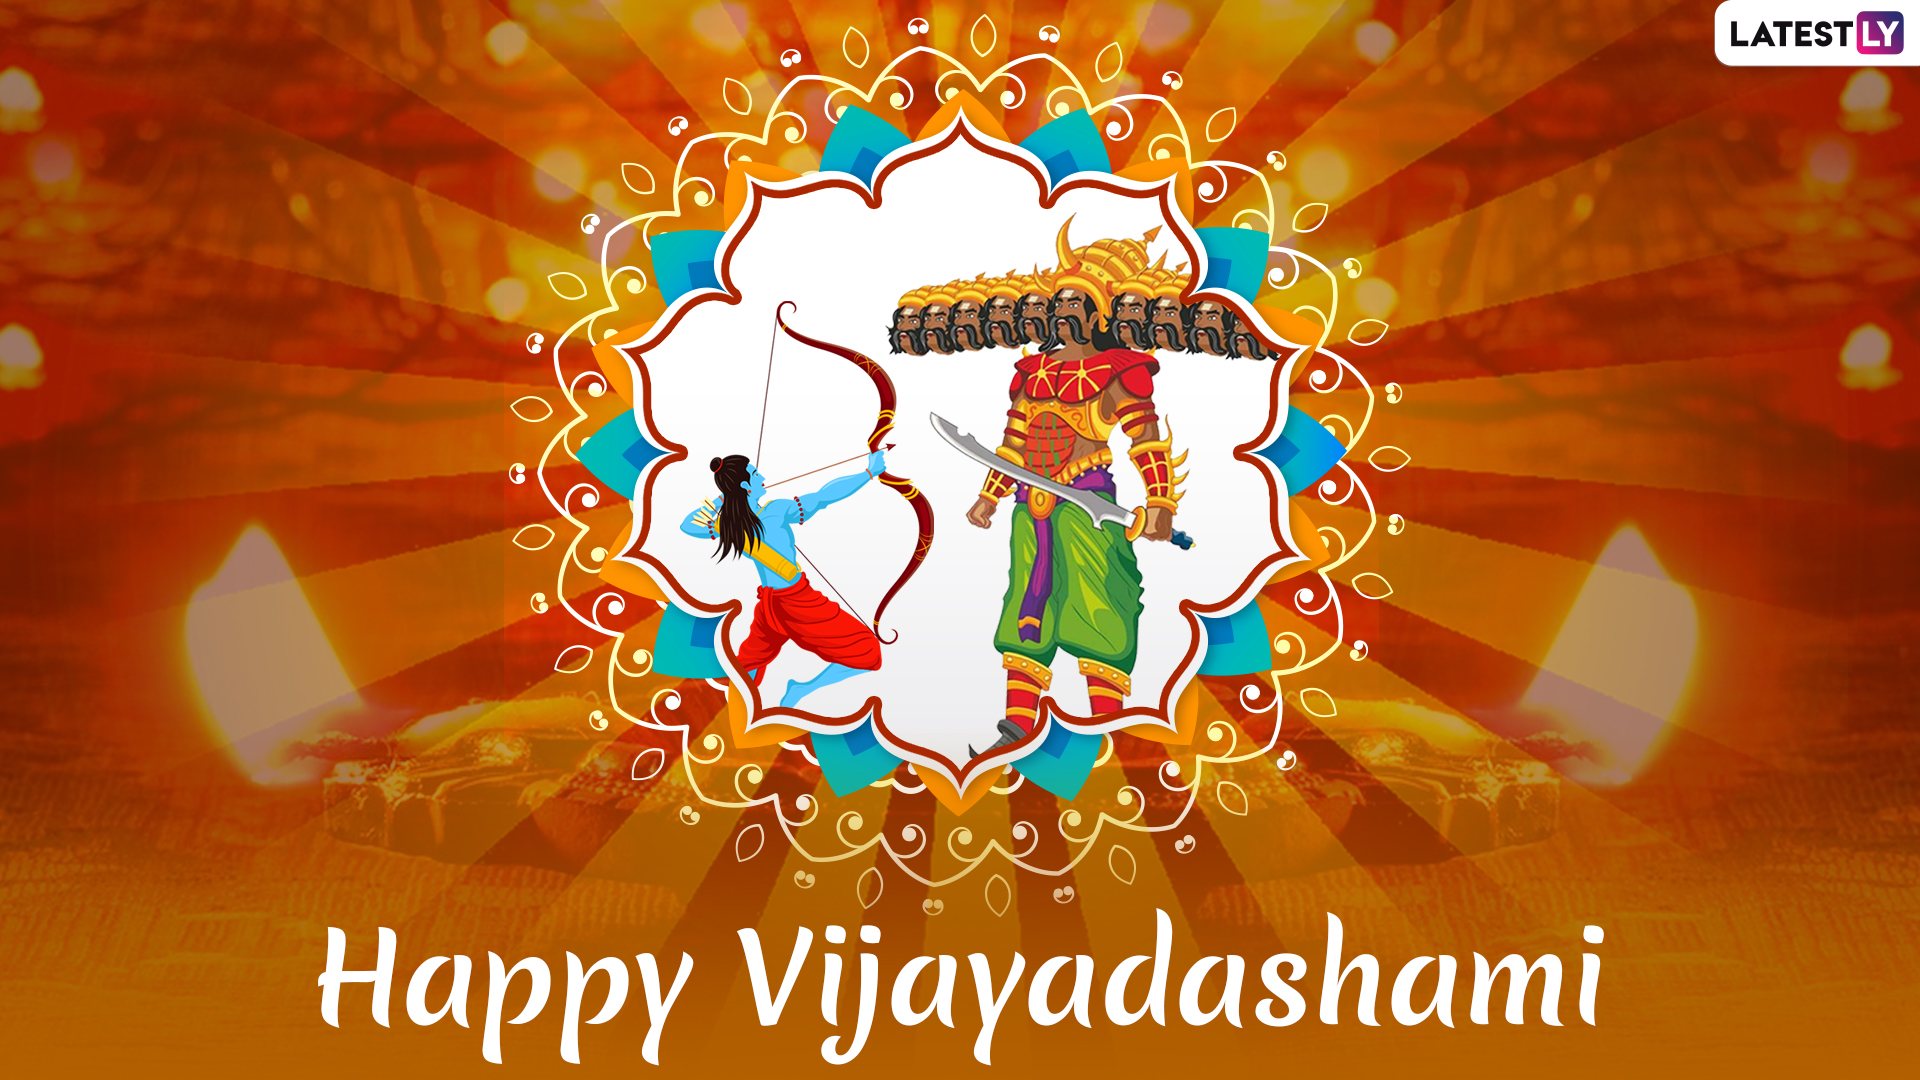 Happy Vijayadashami 2019 Greetings: WhatsApp Stickers, Maa Durga GIF Images, Ram Ravan Yudh Photos and SMS to Send on Dussehra